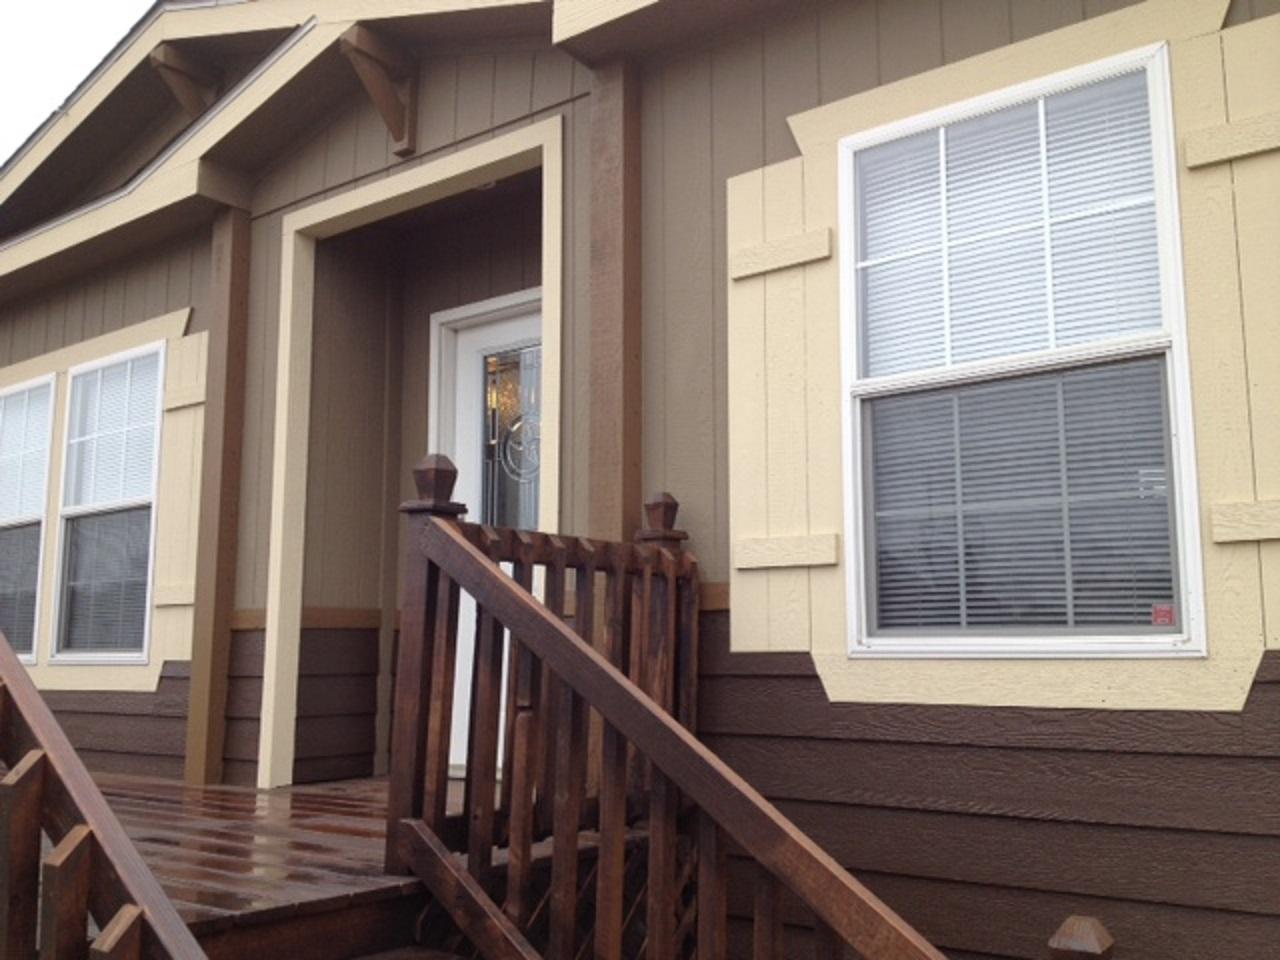 Clayton homes in wichita ks 67217 for New home builders wichita ks